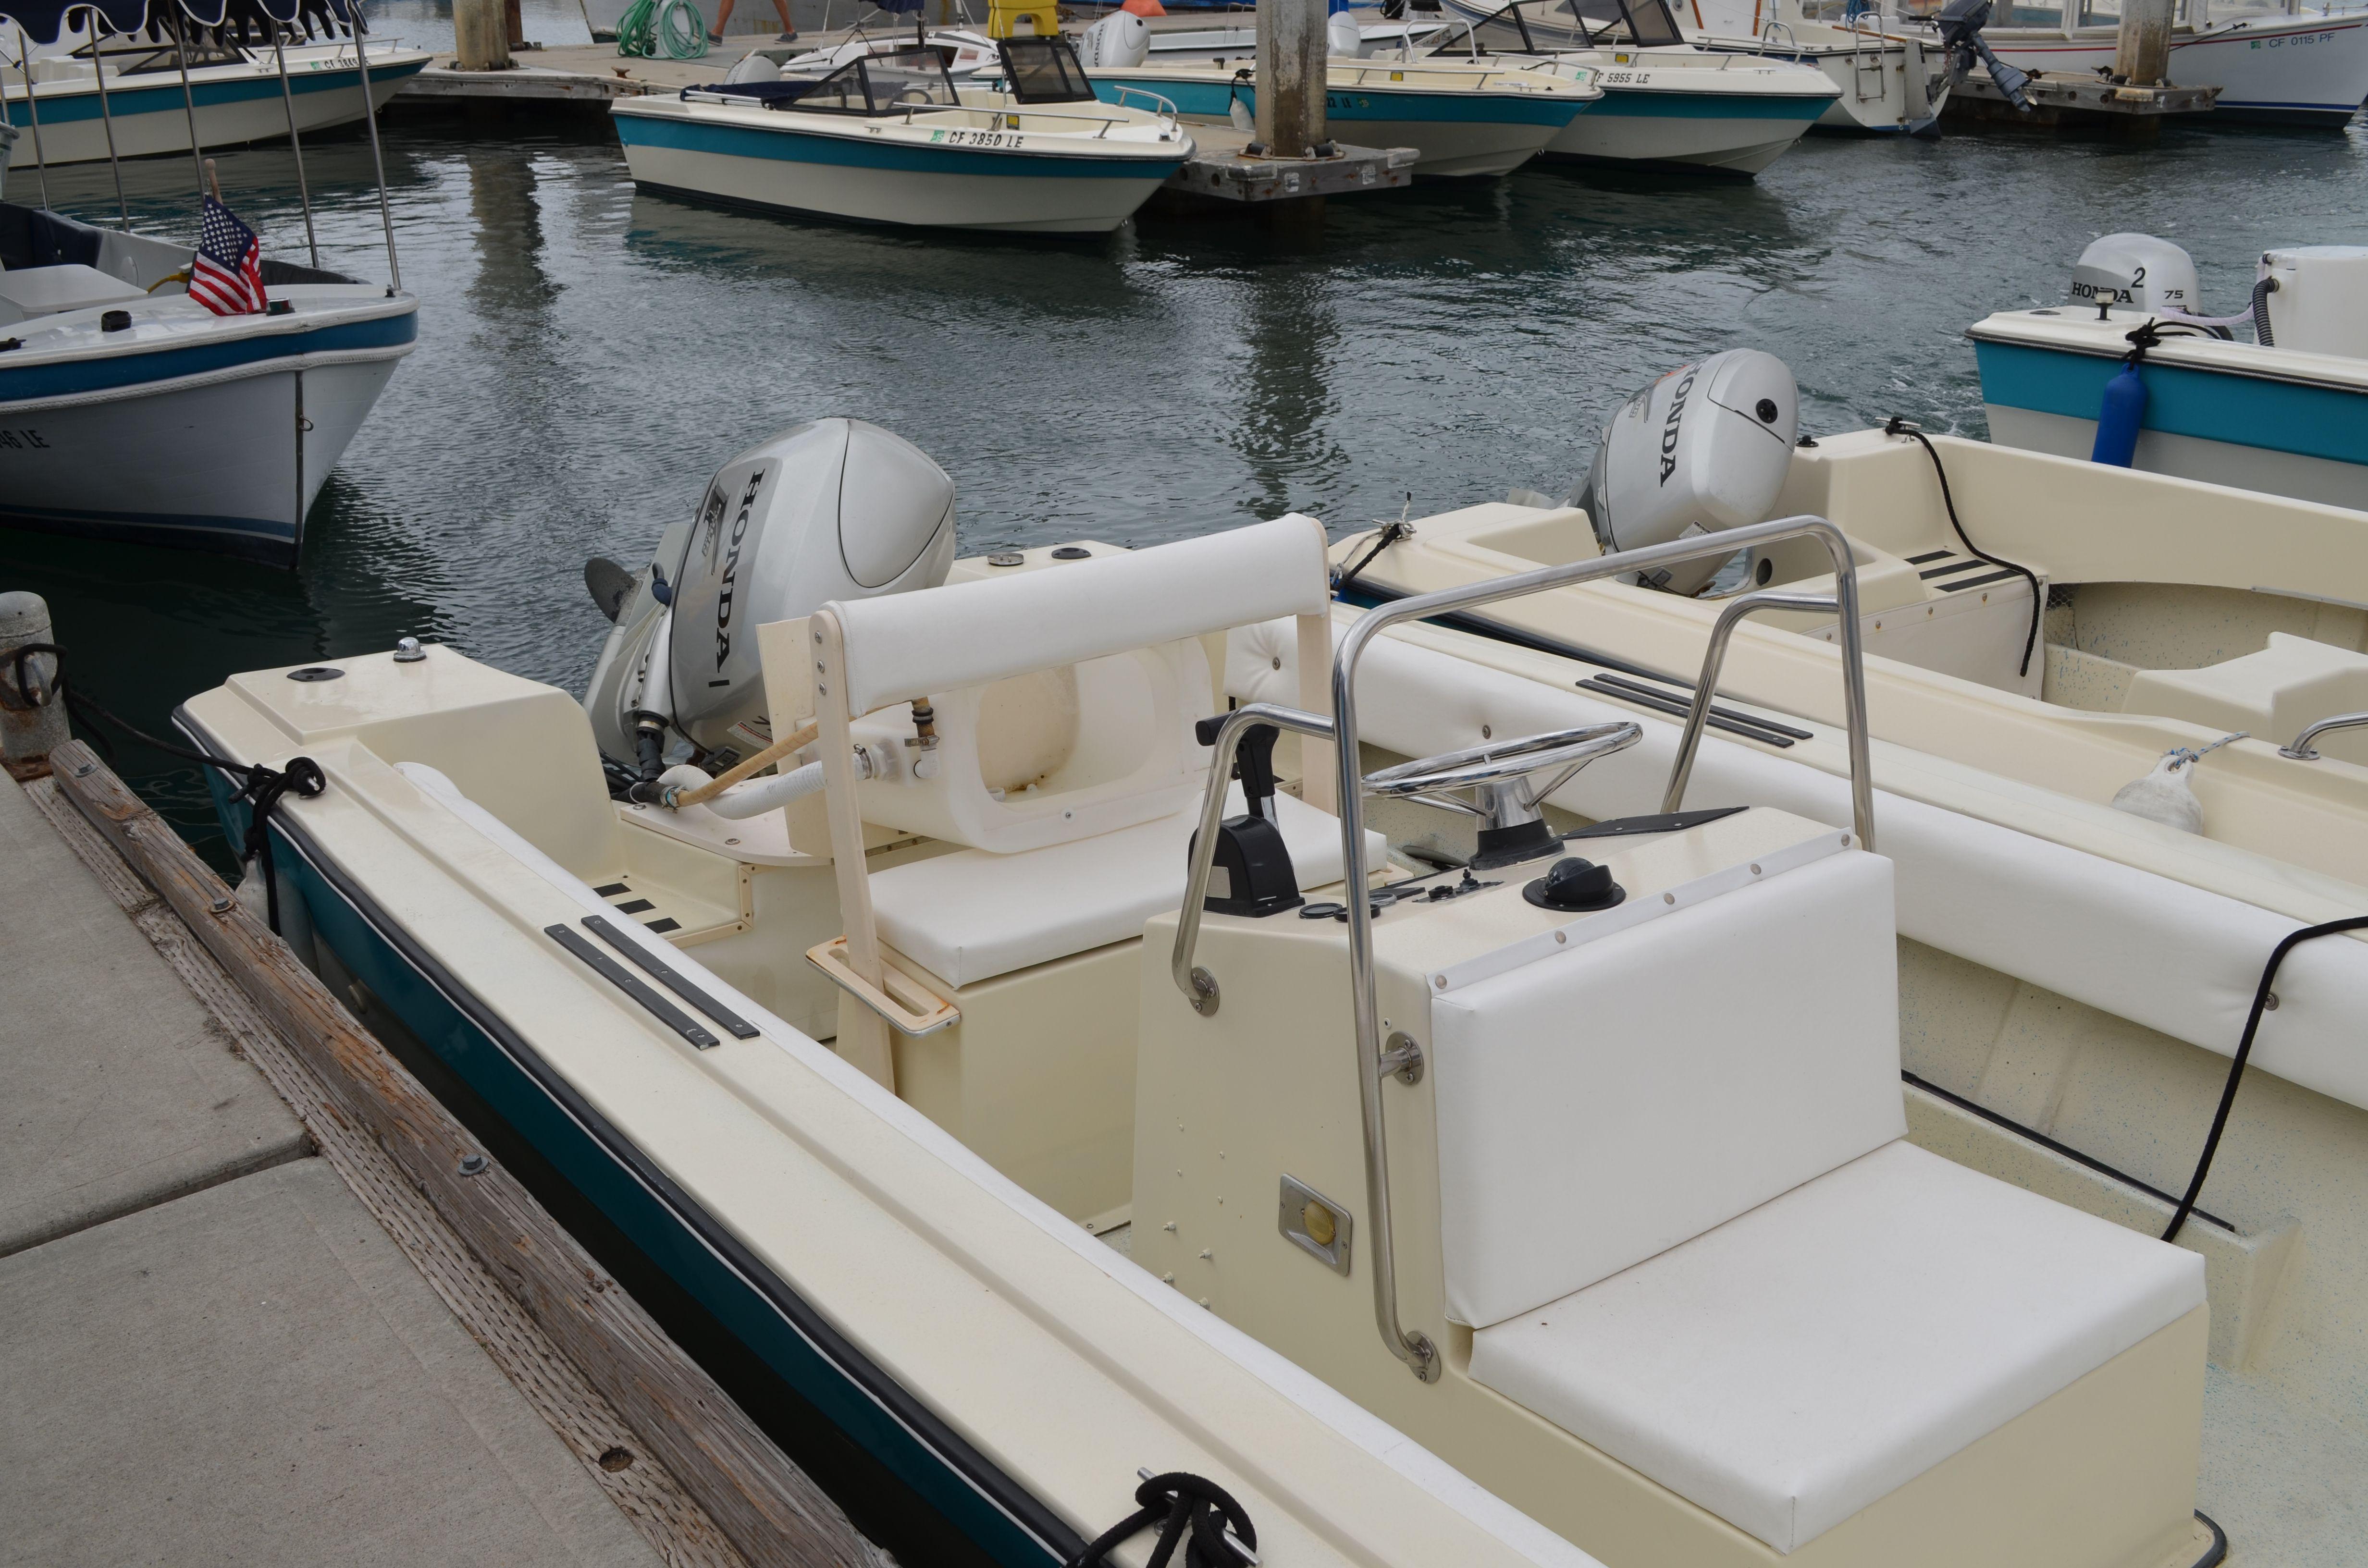 Oceanside Fishing Boat Rental